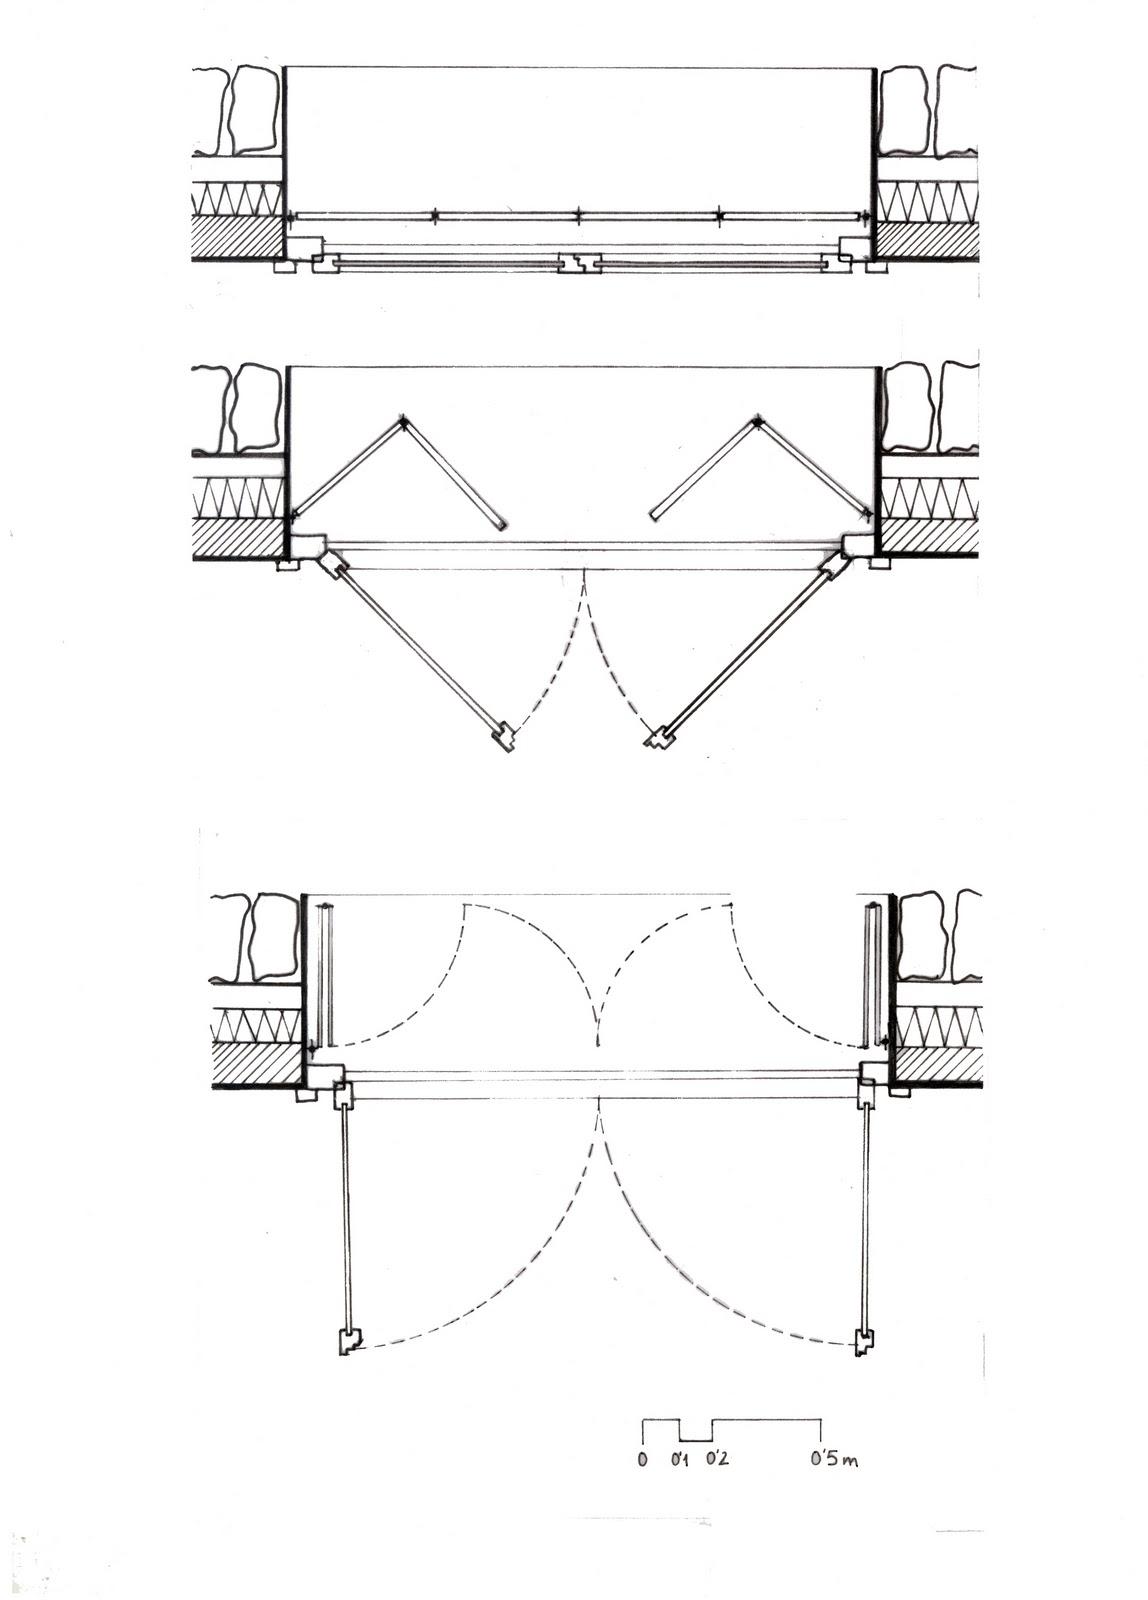 Casa de piedra an lisis de la obra for Simbologia de puertas en planos arquitectonicos